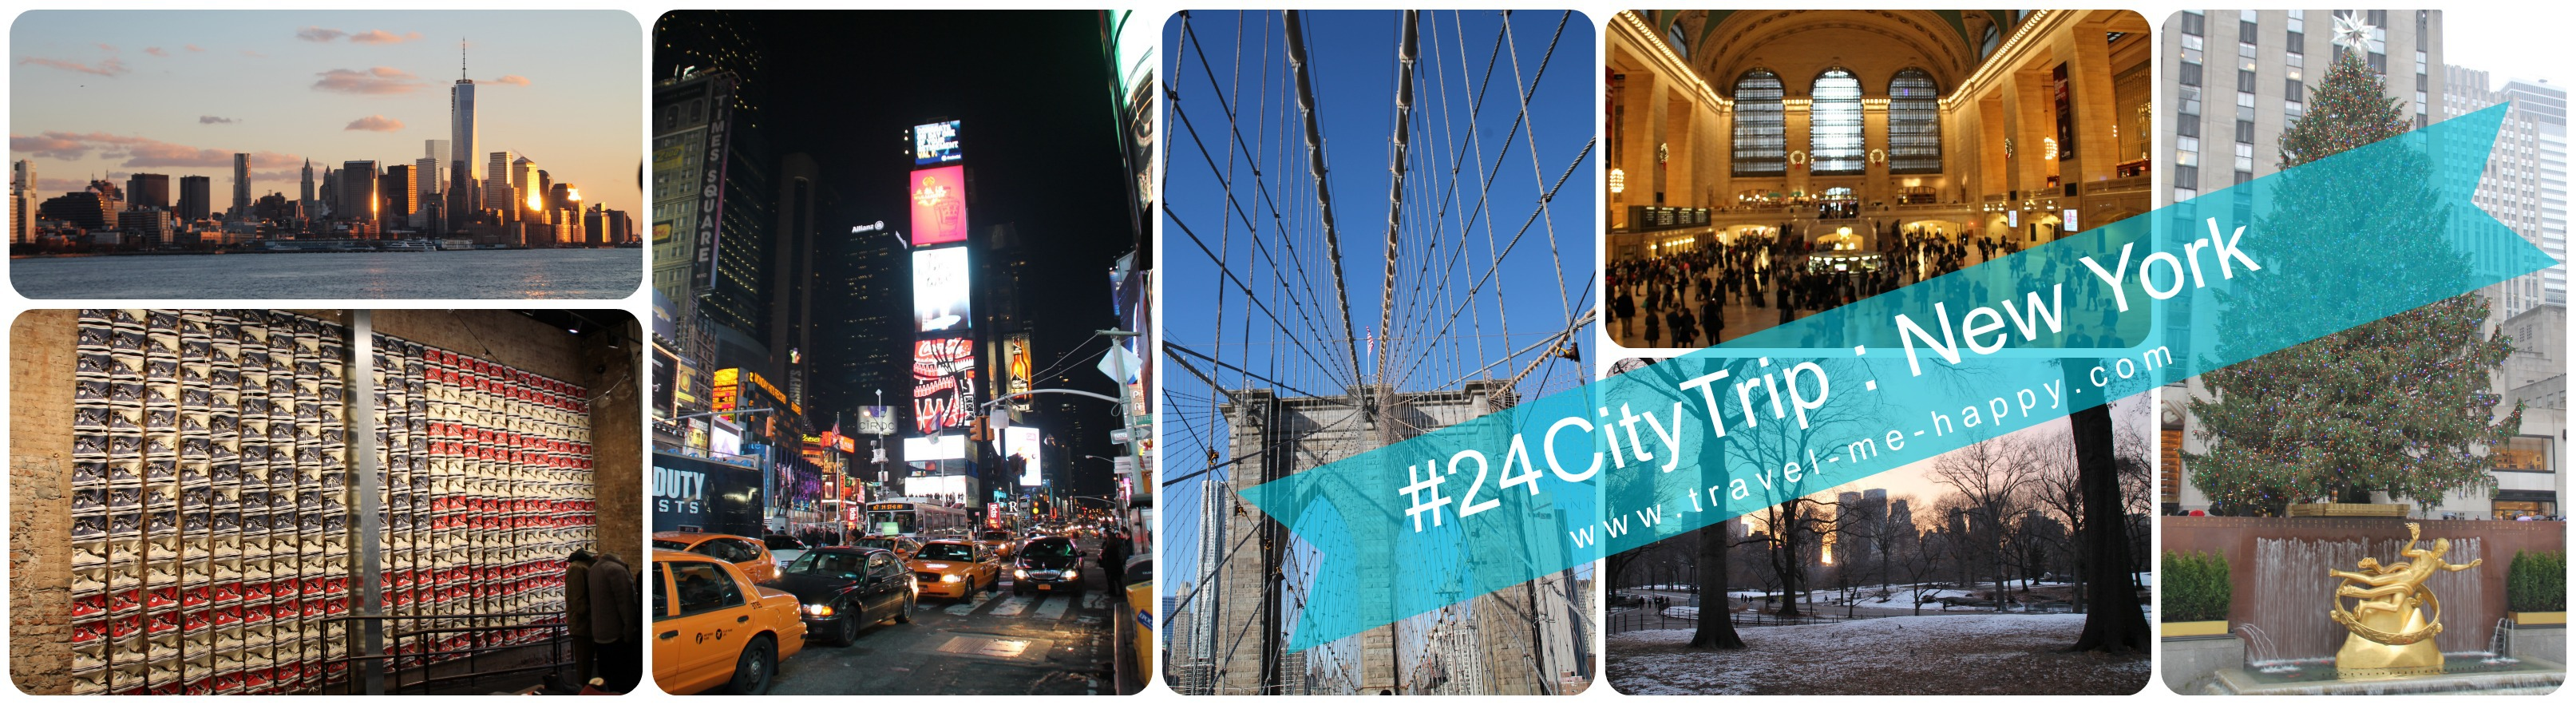 24NYCfinal_PicMonkey Collage.jpg.jpg